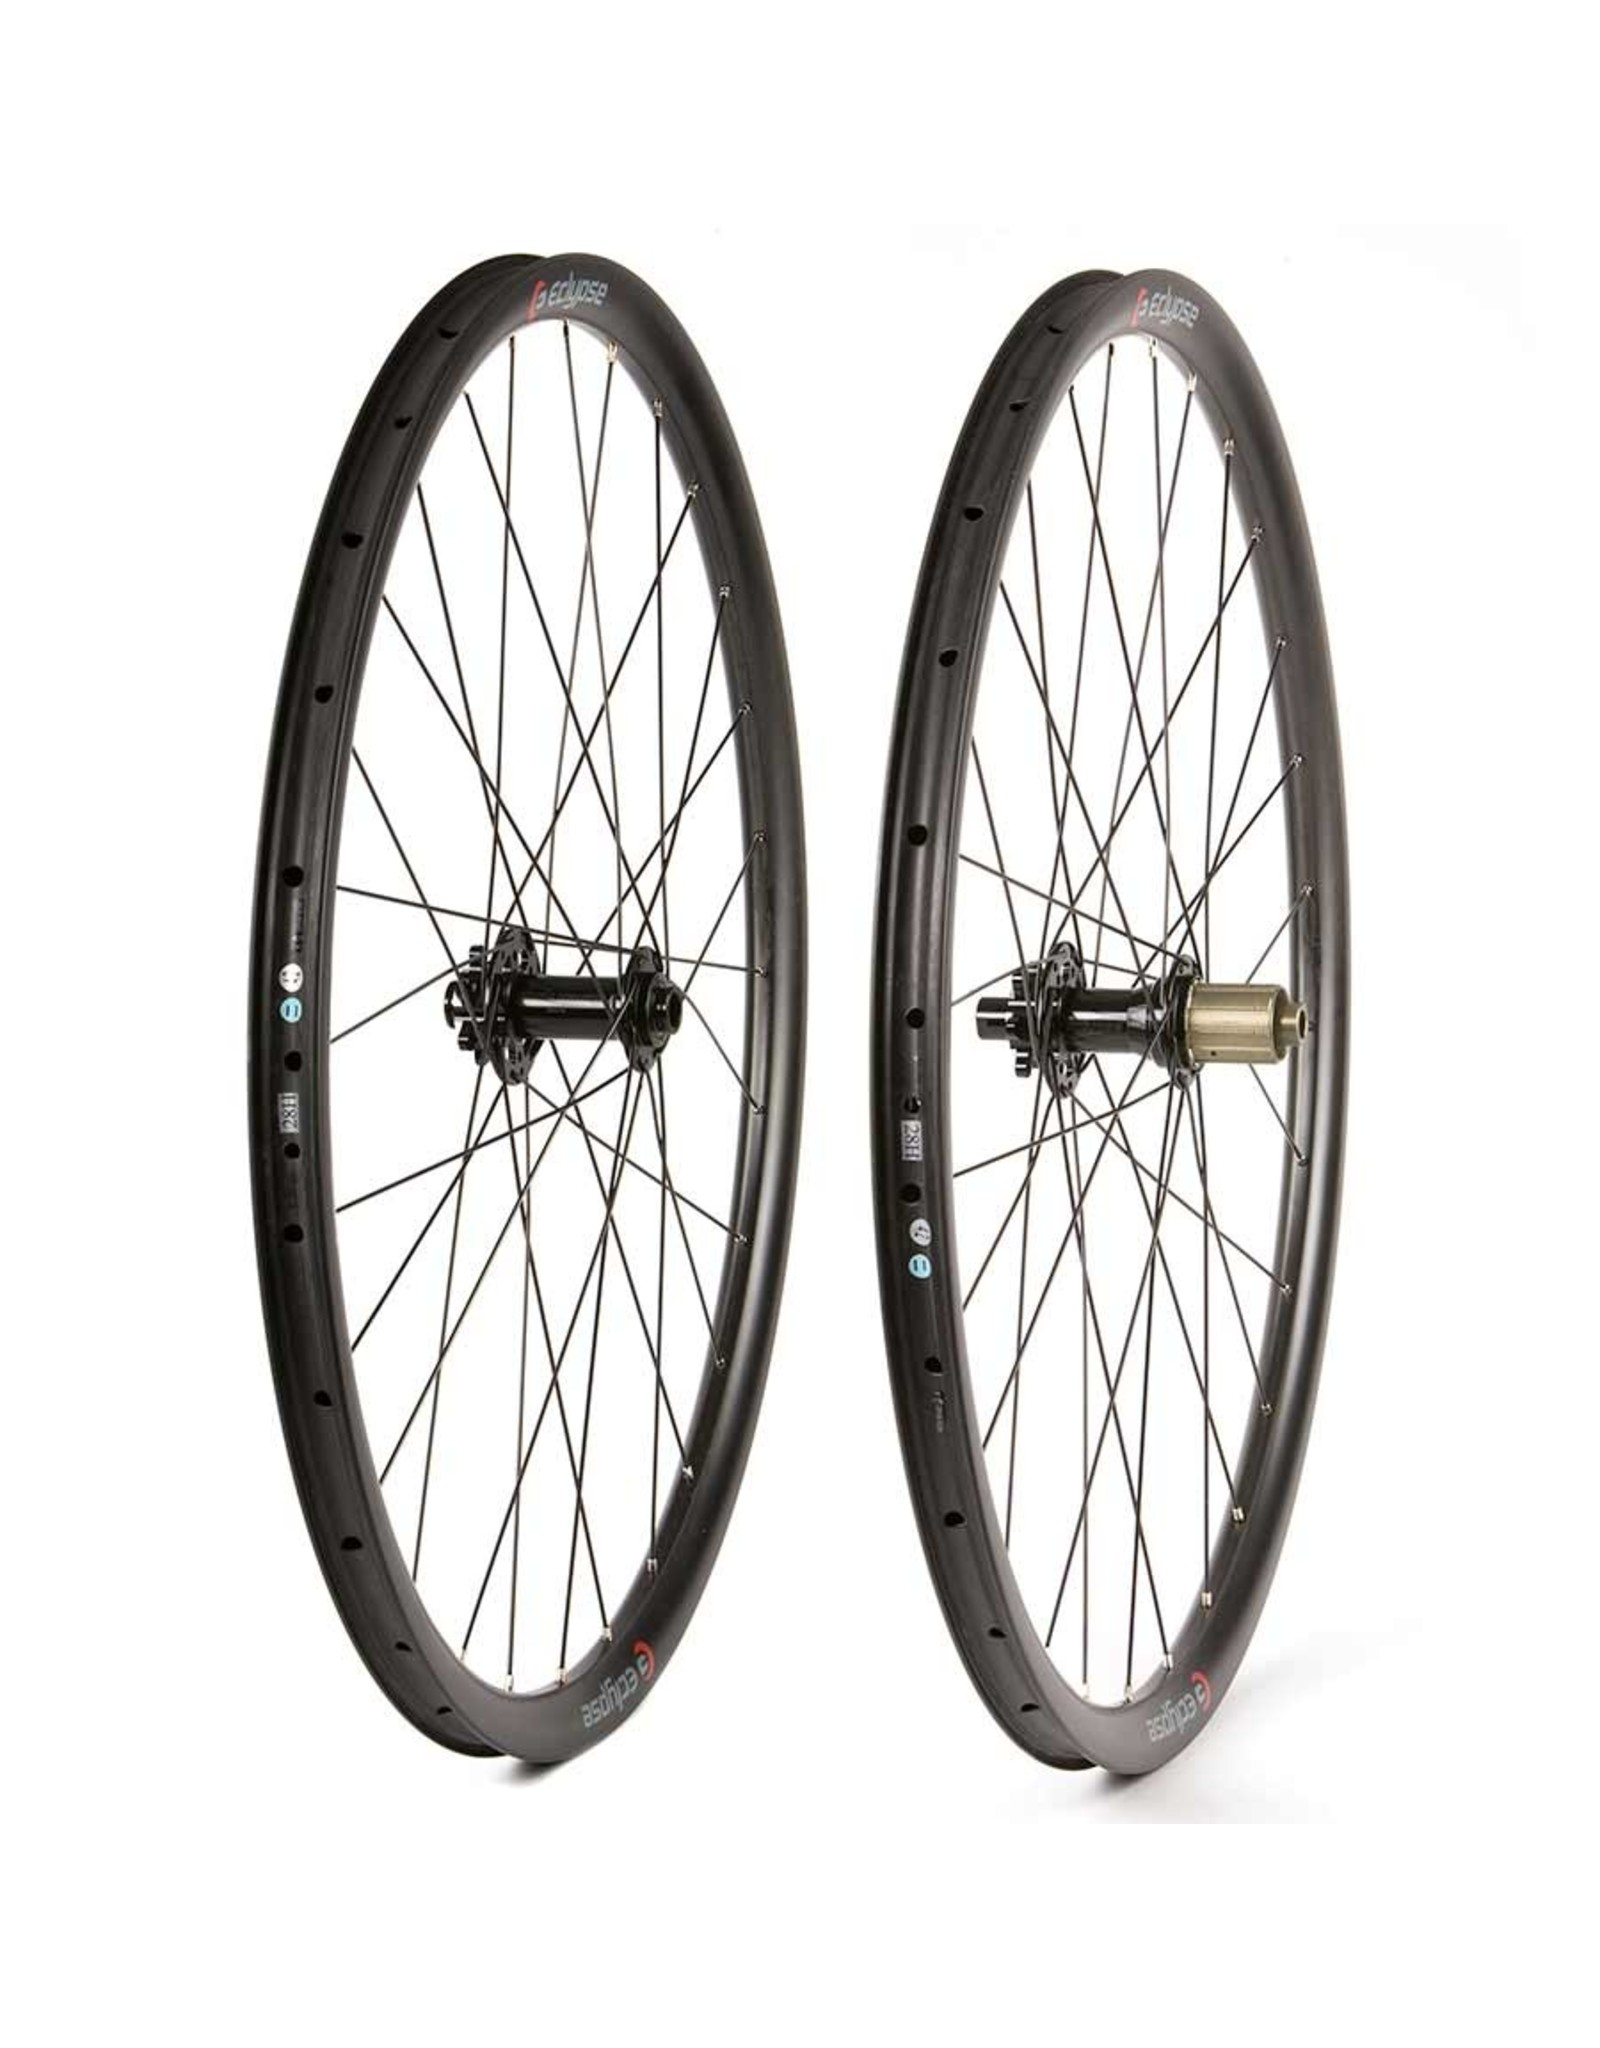 Eclypse, S9 Gravel 700C, Wheel, Front and Rear, 700C / 622, Holes: F: 28, R: 28, 12mm TA, F: 100, R: 142, Disc Center Lock, Shimano HG 11, Pair